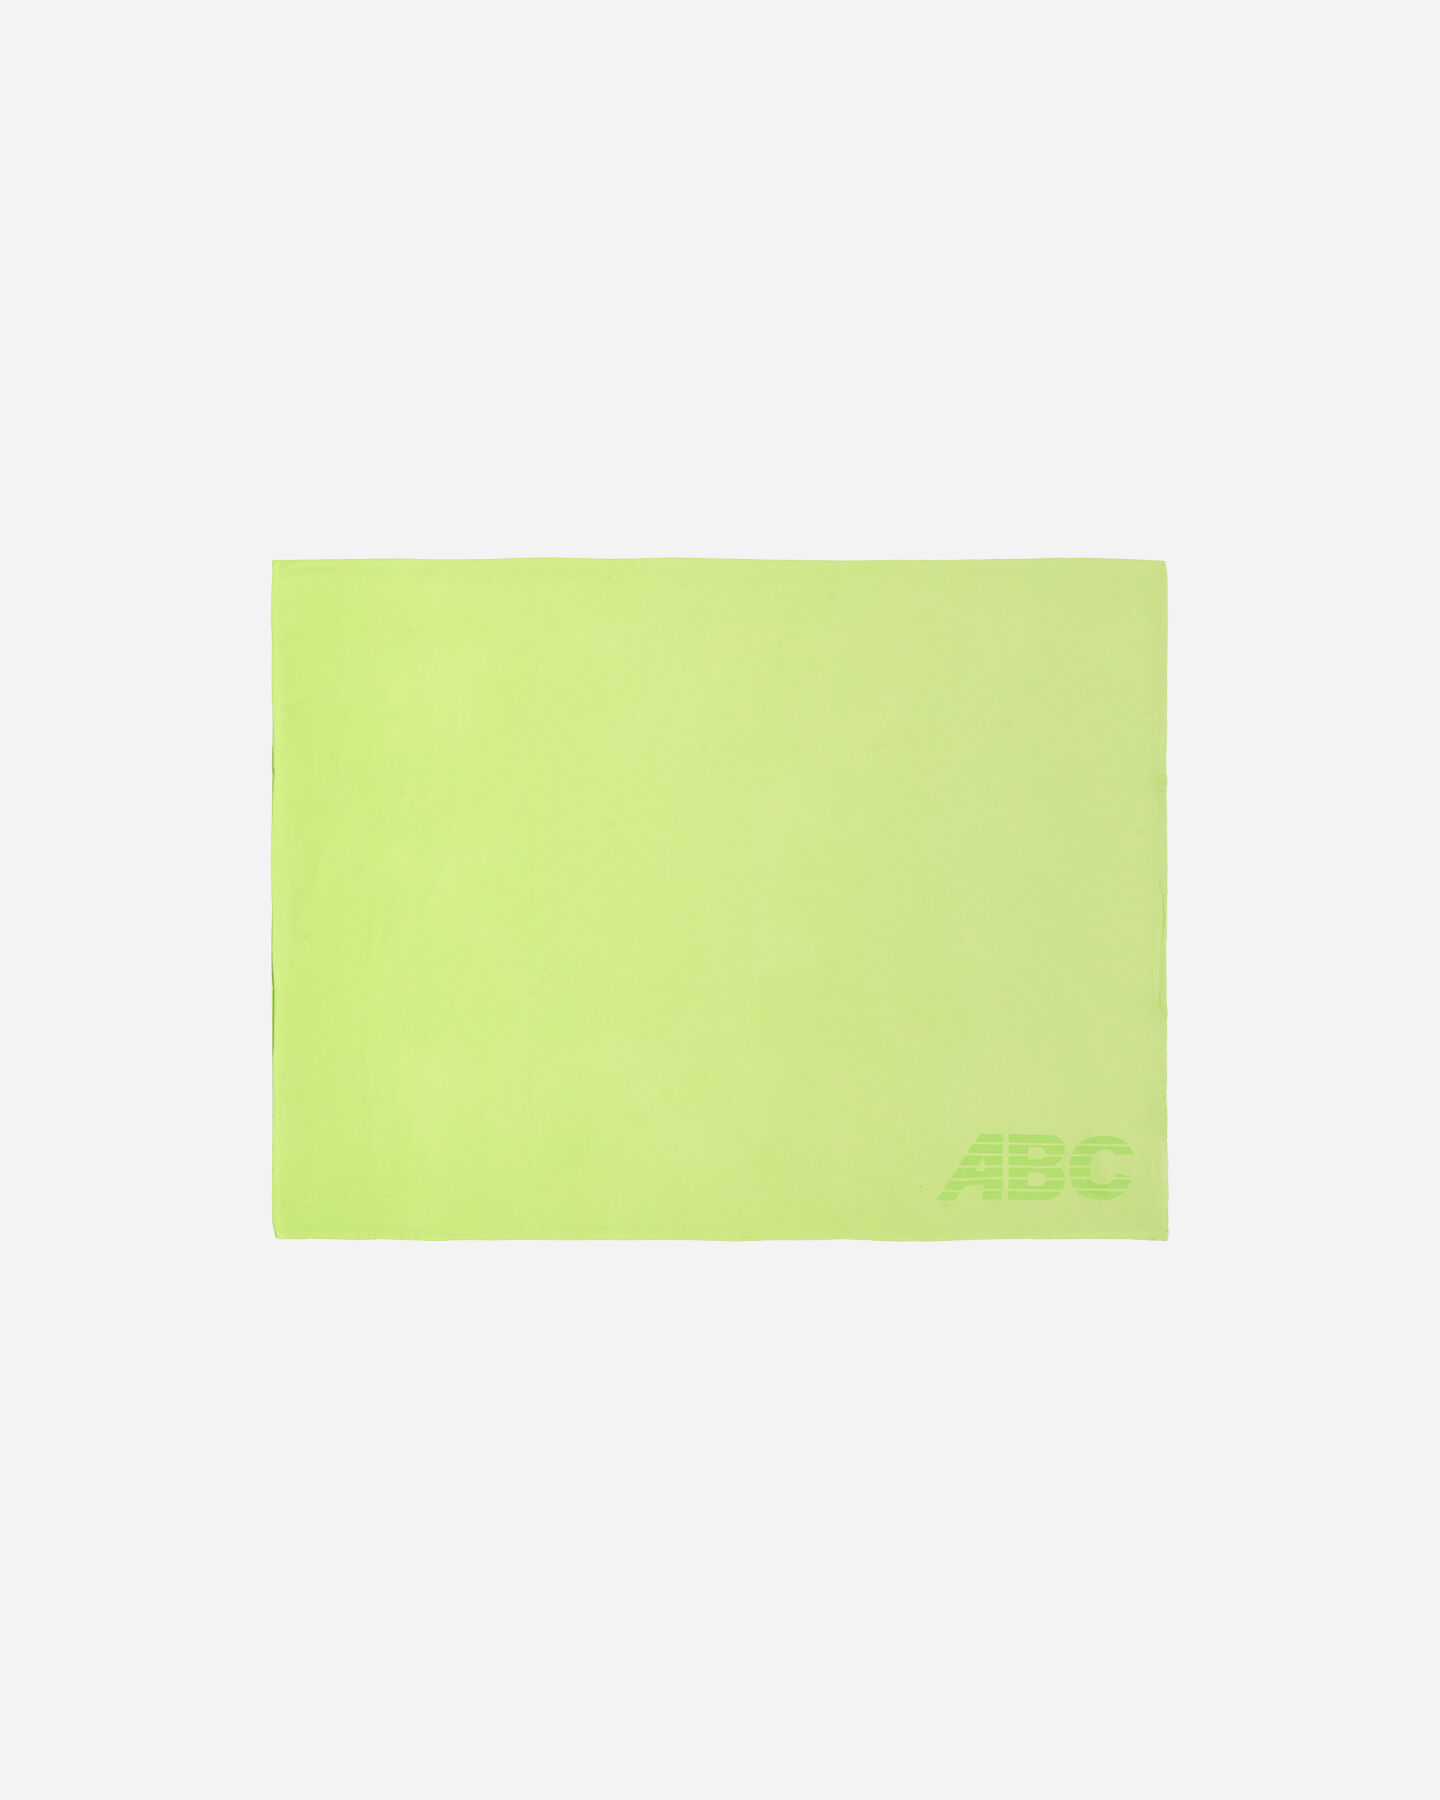 Telo ABC BASIC MICROFIBER 150X100 S4069042 scatto 1